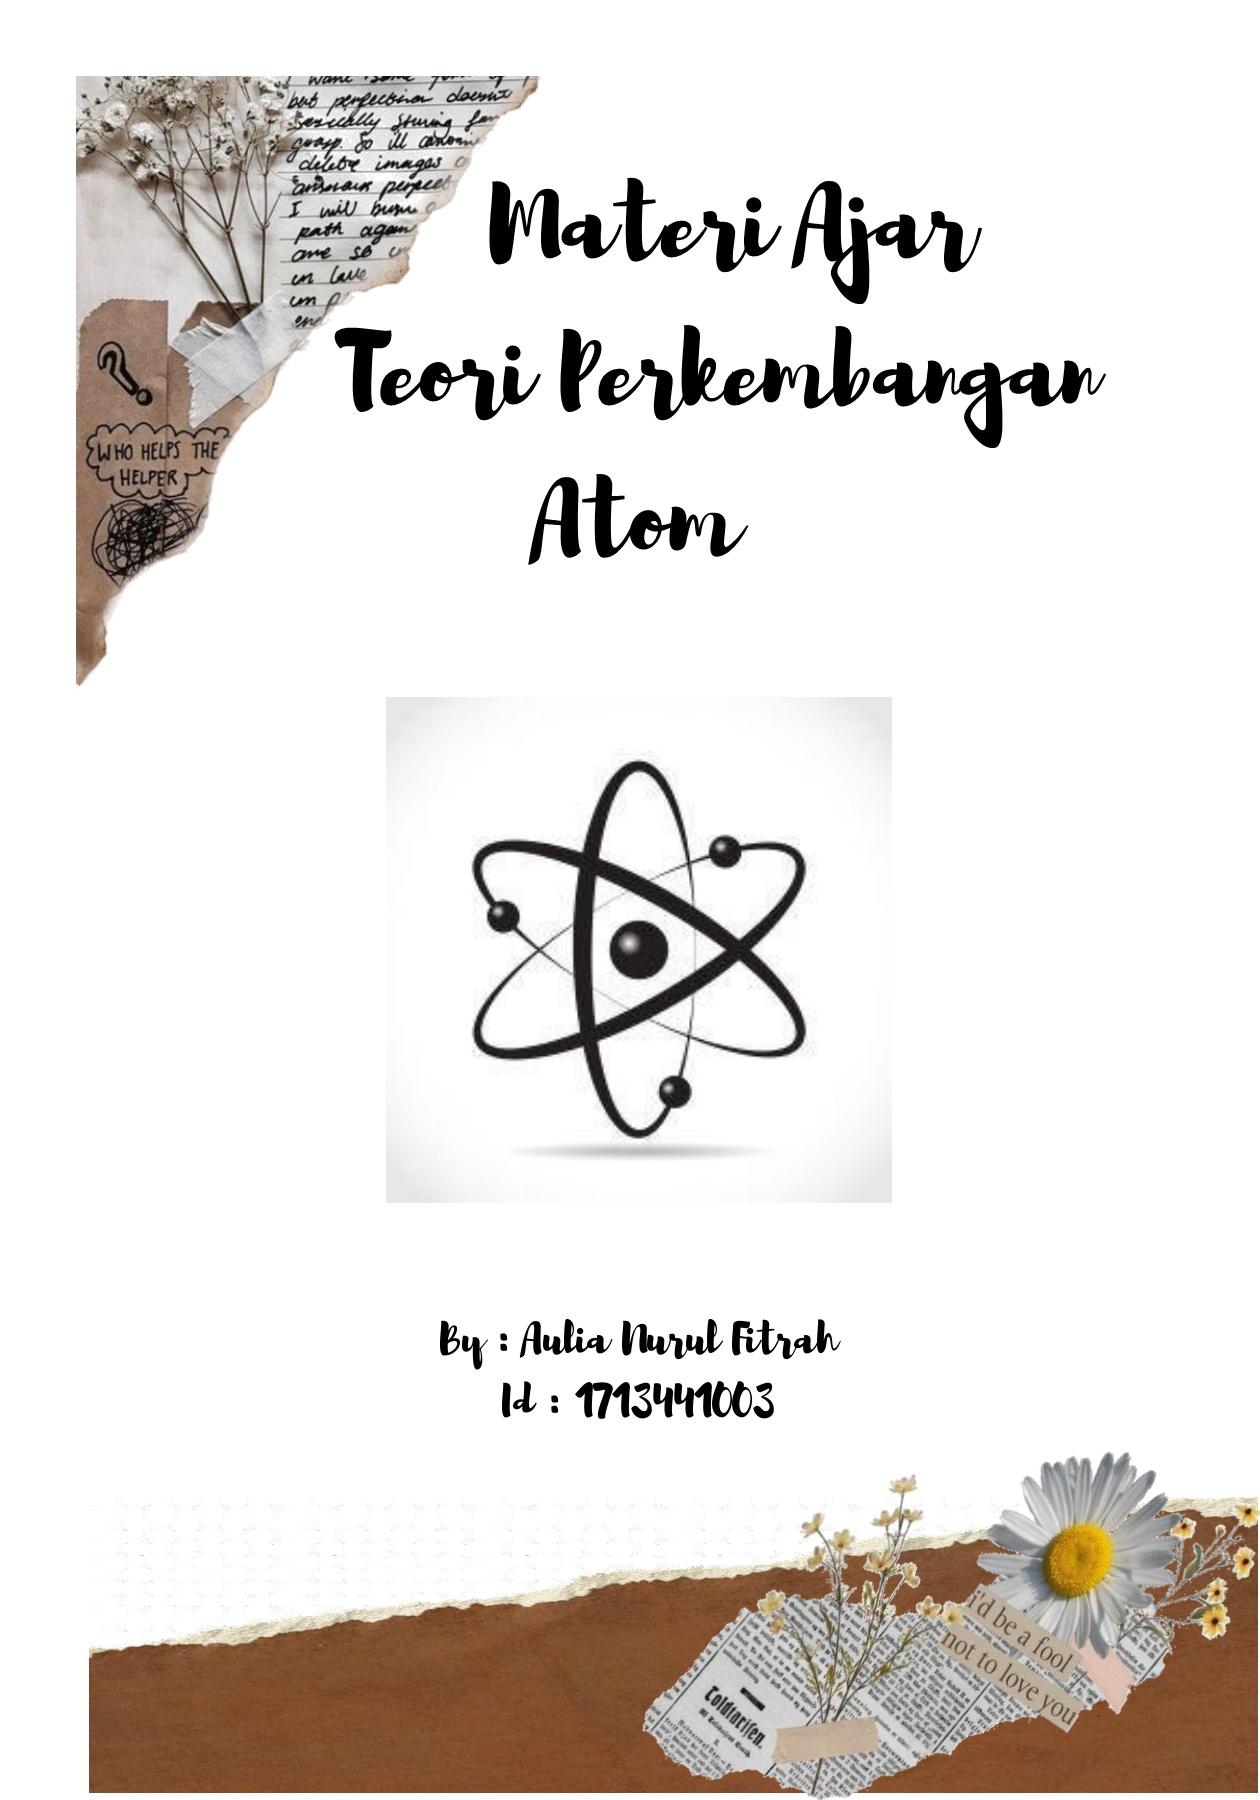 Teori Atom Roti Kismis : teori, kismis, Teori, Perkembangan, Atom-Flip, EBook, Pages, AnyFlip